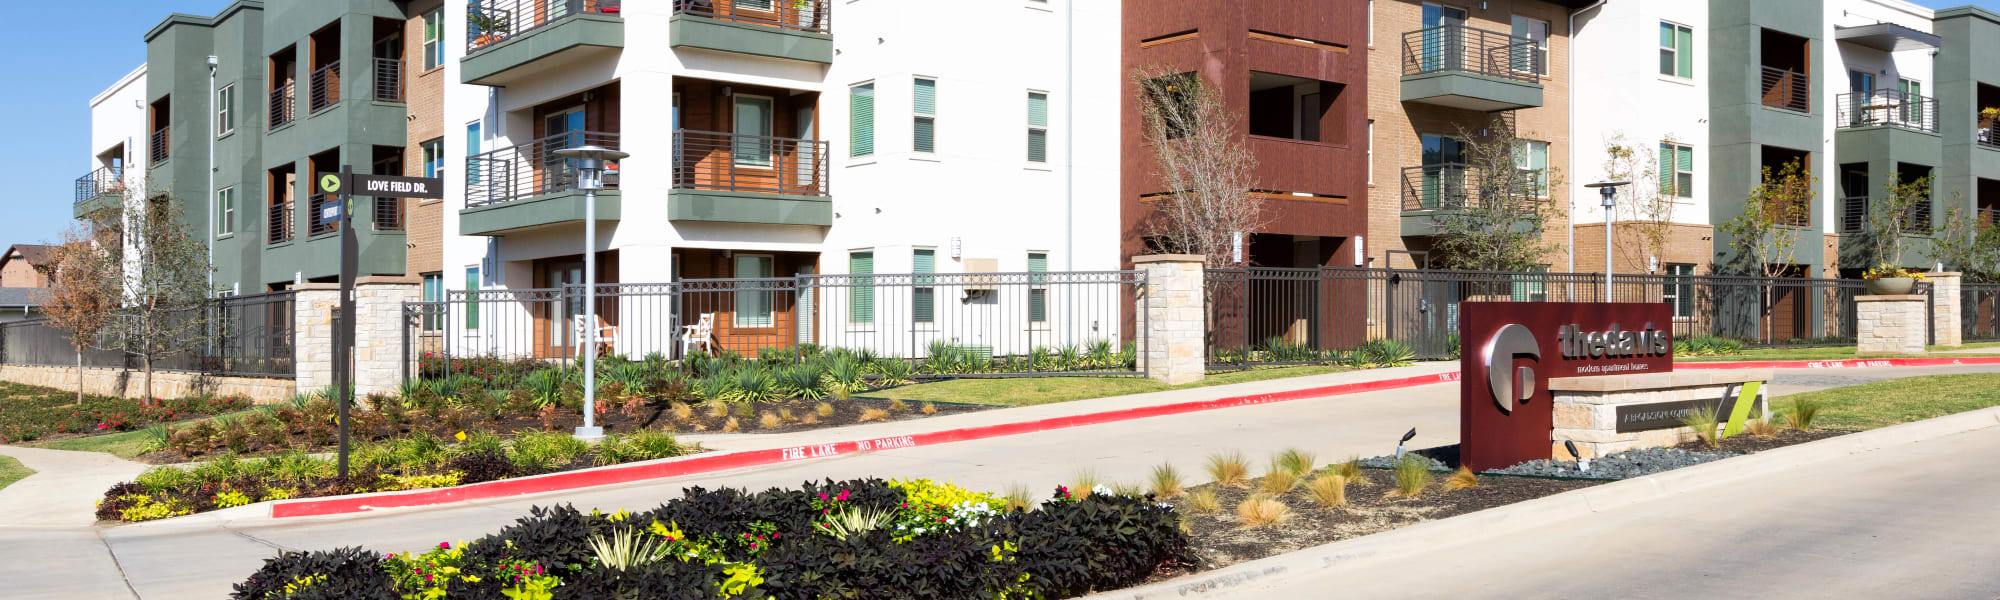 Neighborhood at The Davis in Fort Worth, Texas